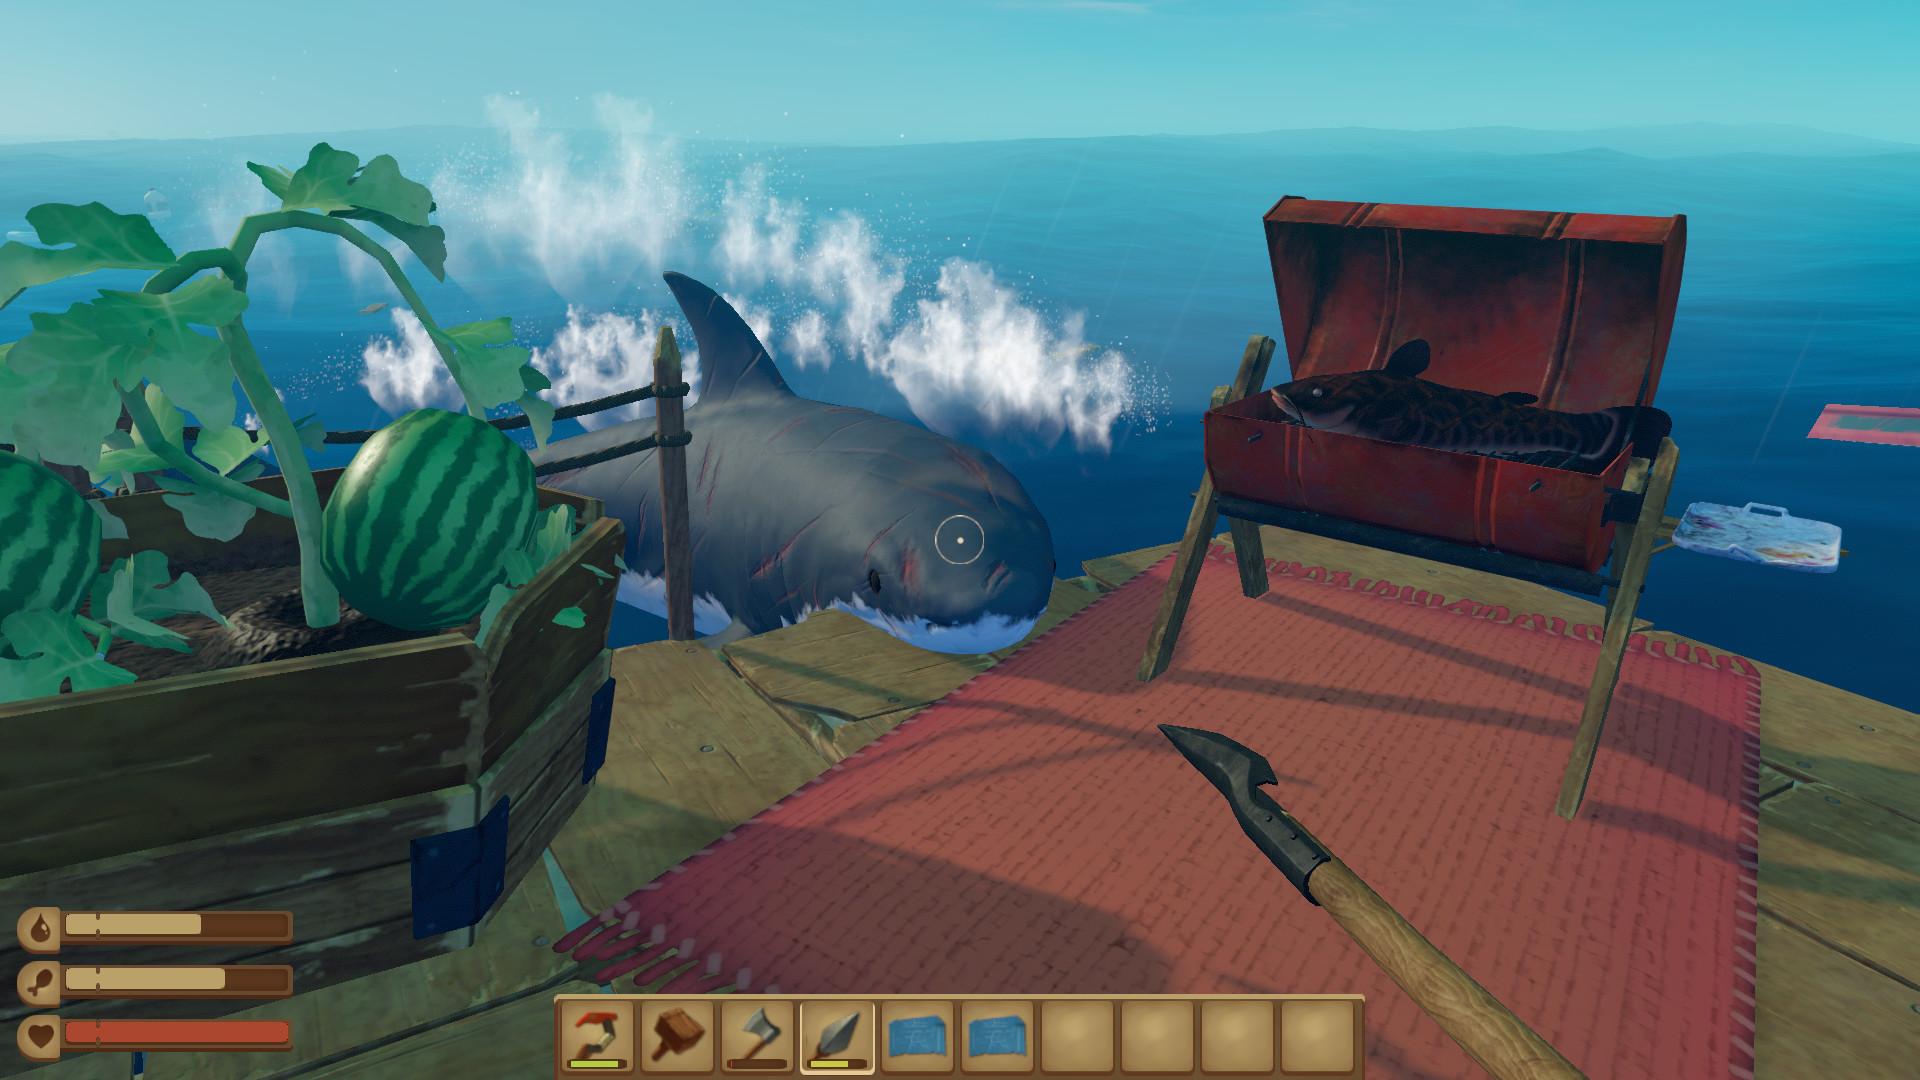 download raft creative mode apk